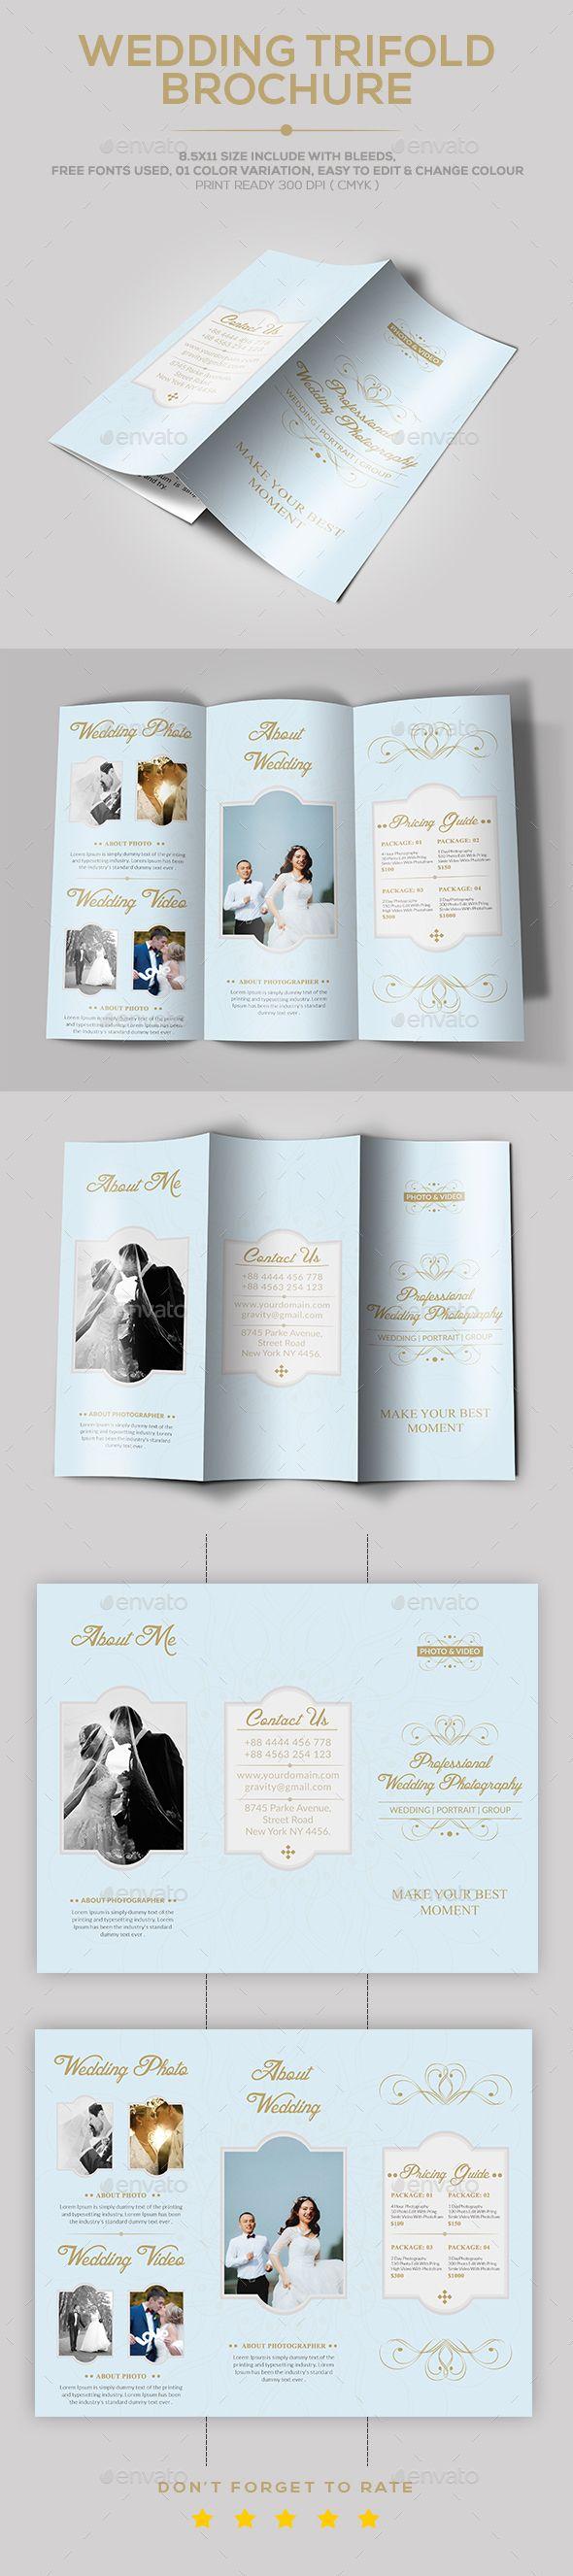 17 Best ideas about Wedding Brochure – Wedding Brochure Template